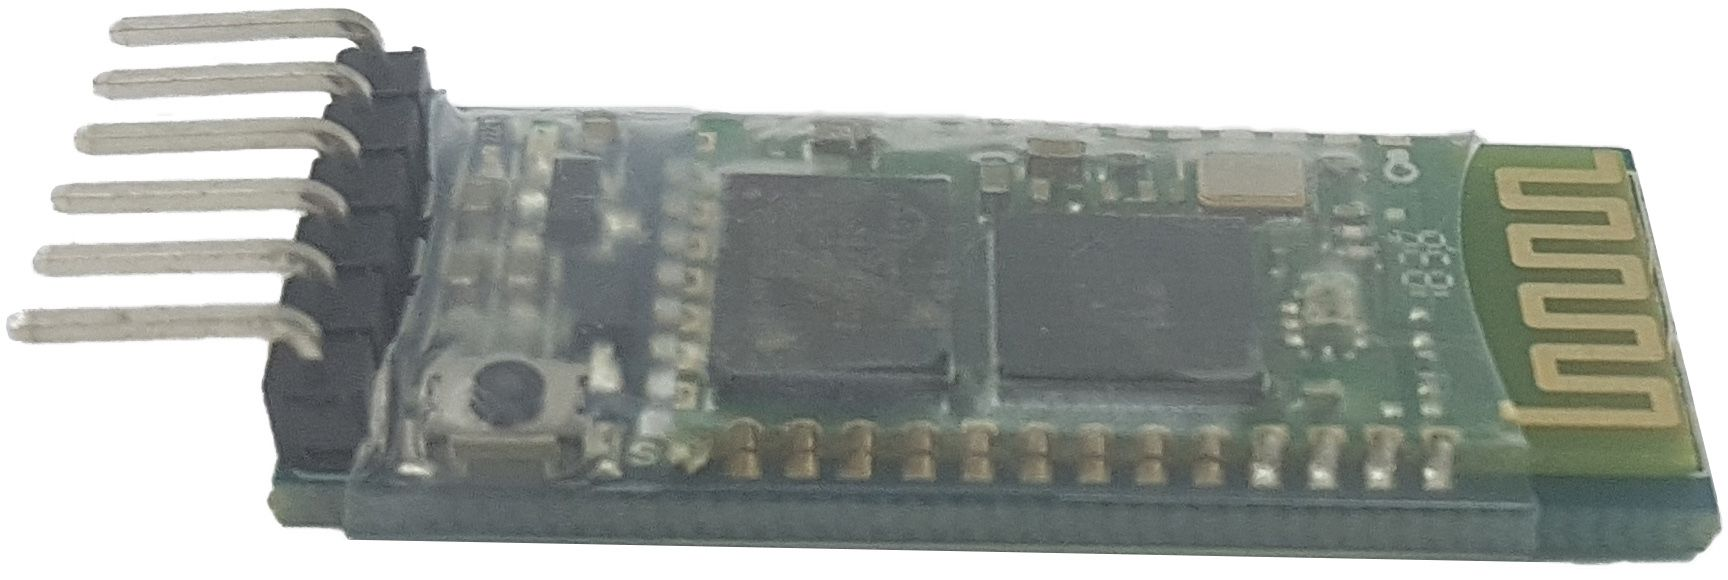 Shield Bluetooth hc-05